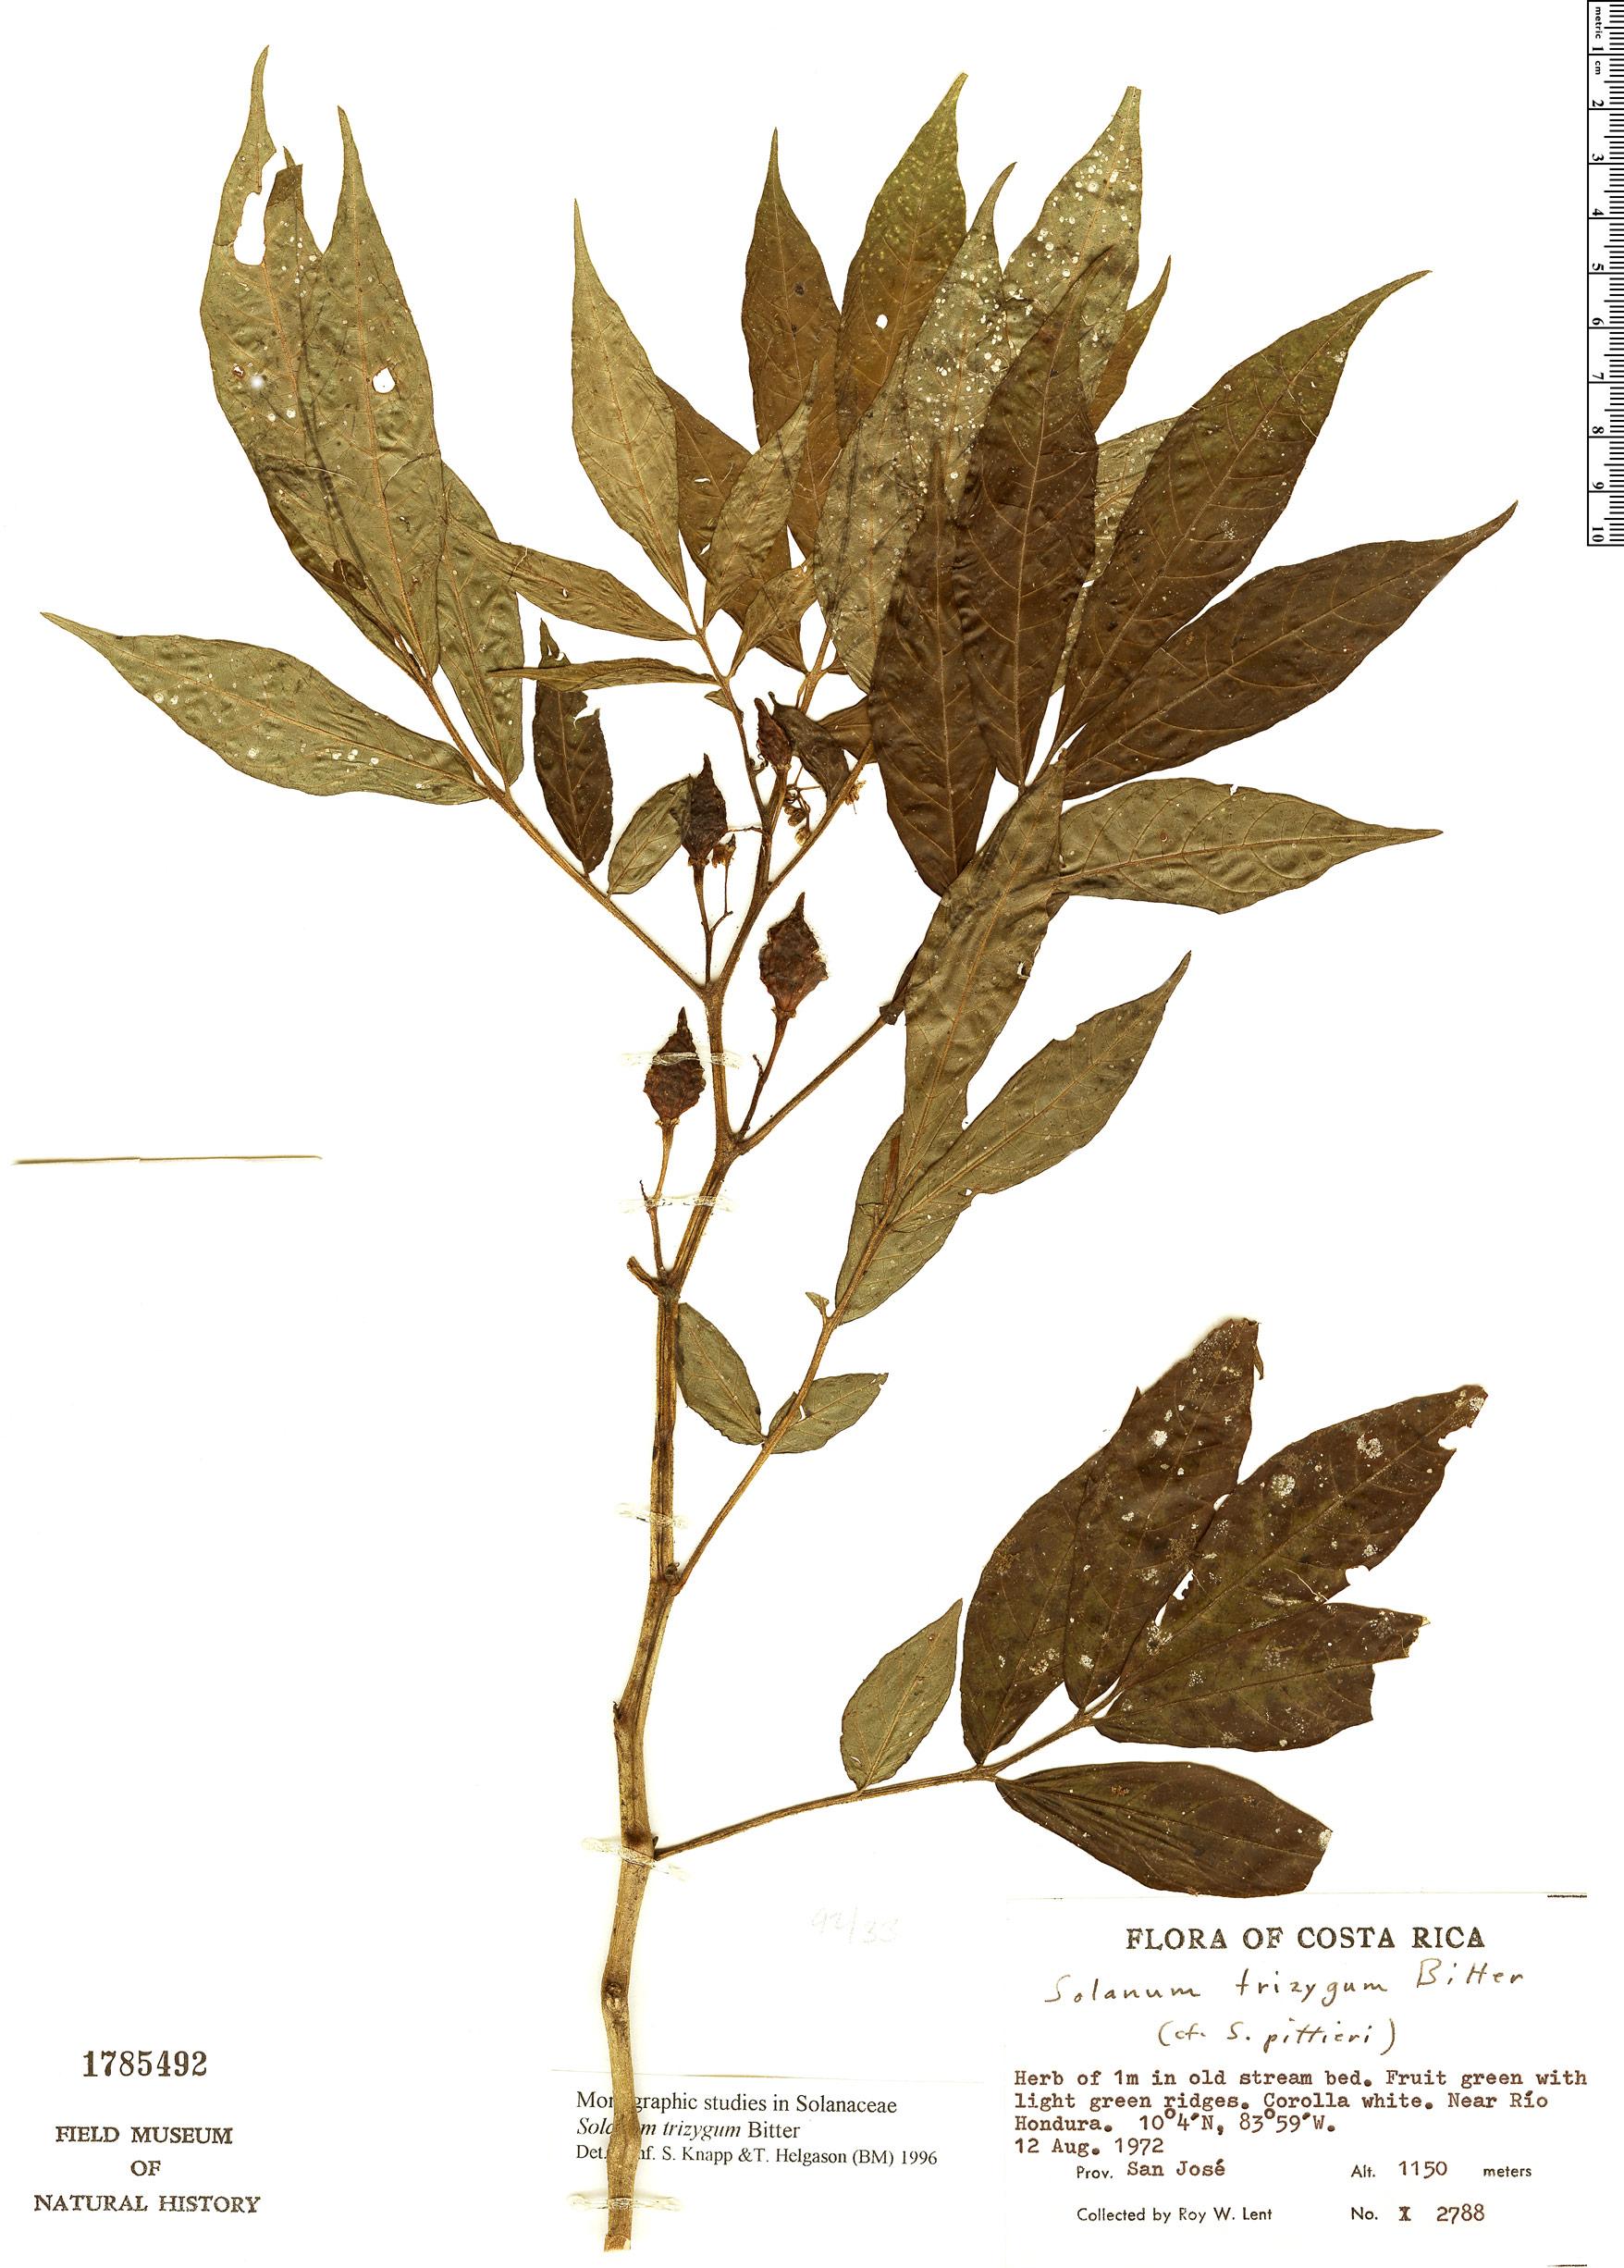 Espécimen: Solanum trizygum